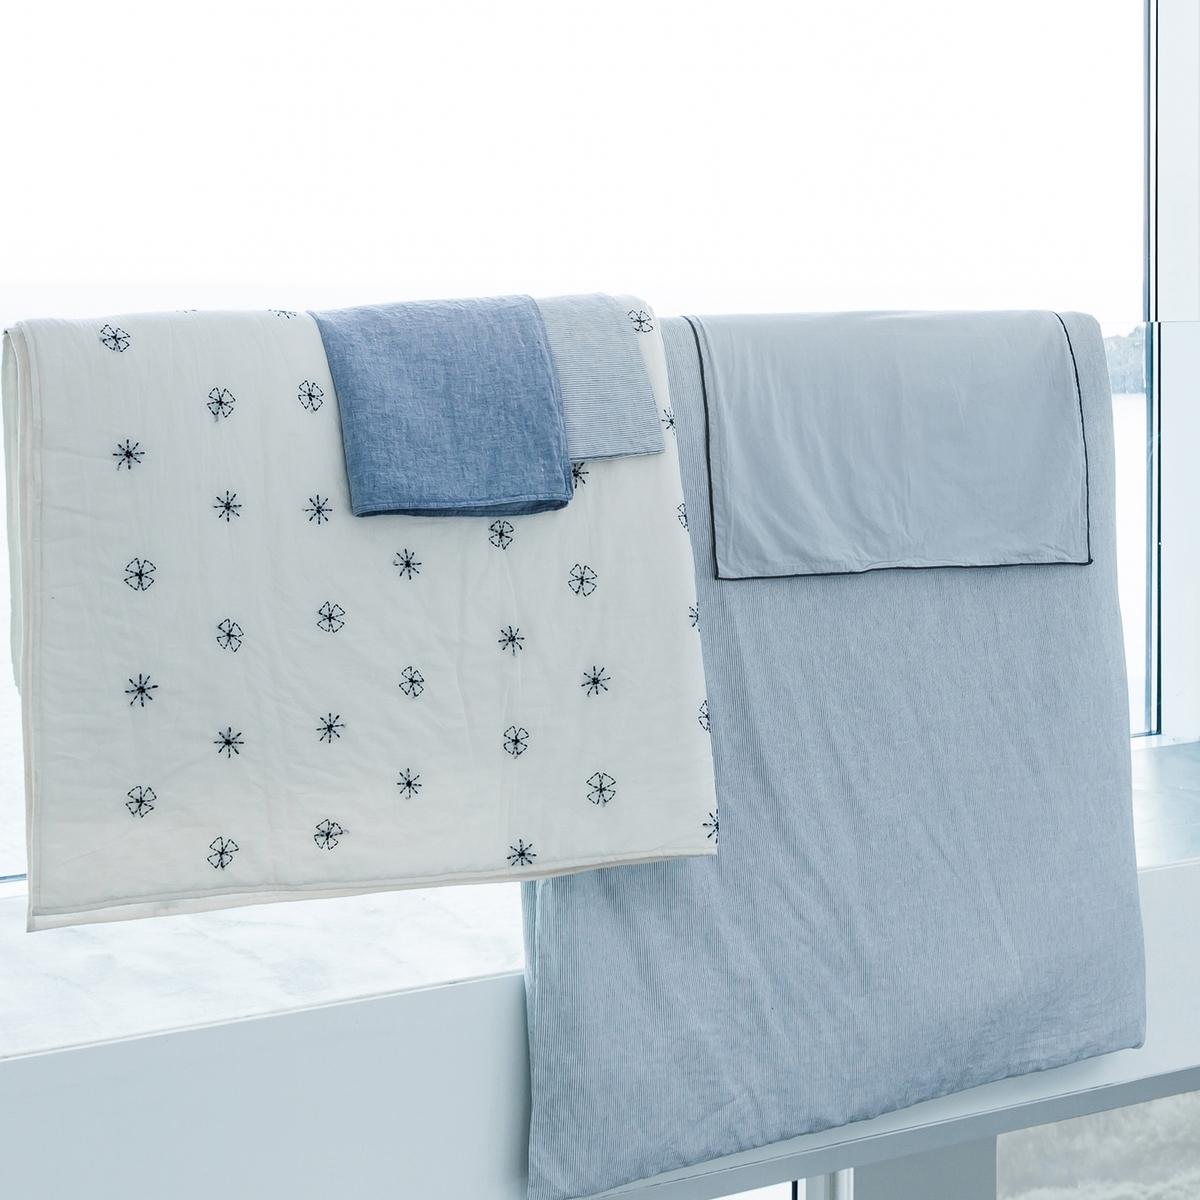 Fronha de almofada em cambraia de linho lavado, Elina cambraia